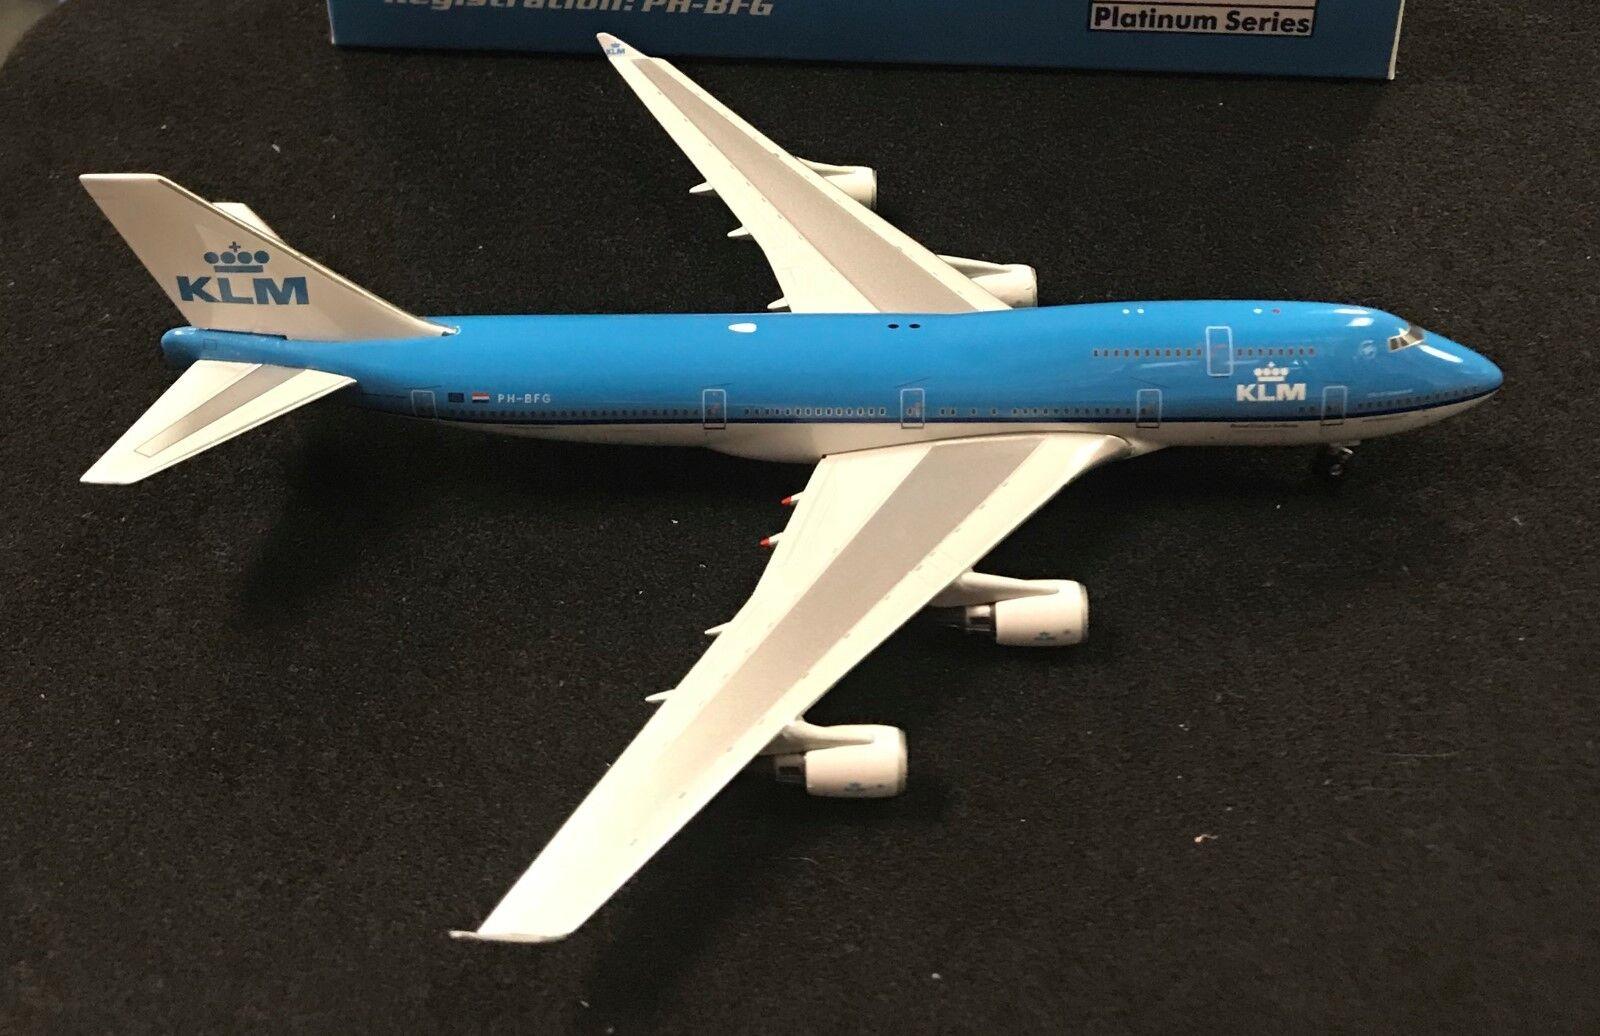 Phoenix 400 KLM Asie B747-400 PH4KLM490 PH-BFG, édition limitée (0040)